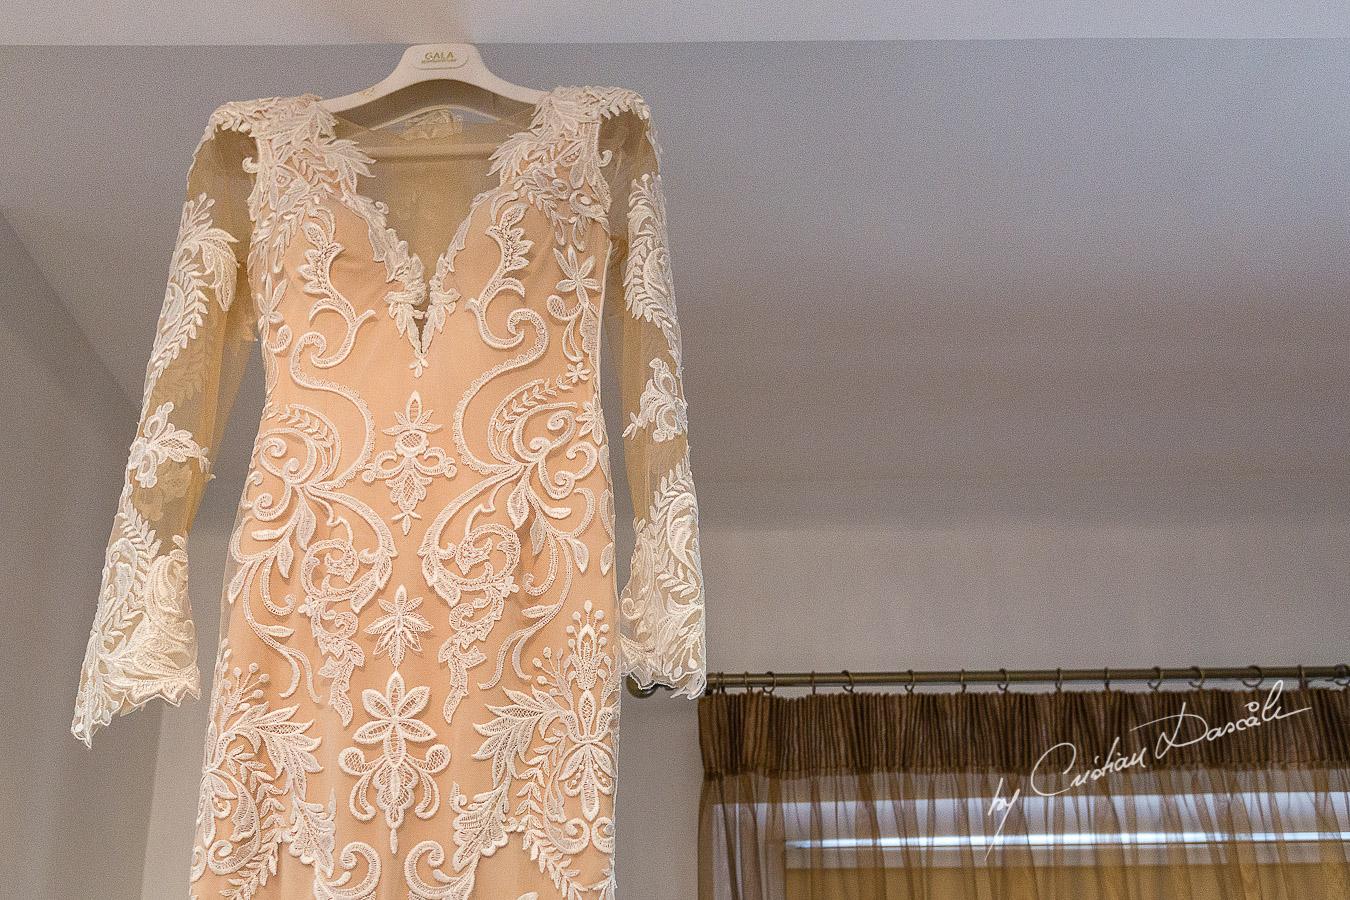 Bridal dress captured at an elegant and romantic wedding at Elias Beach Hotel by Cristian Dascalu.